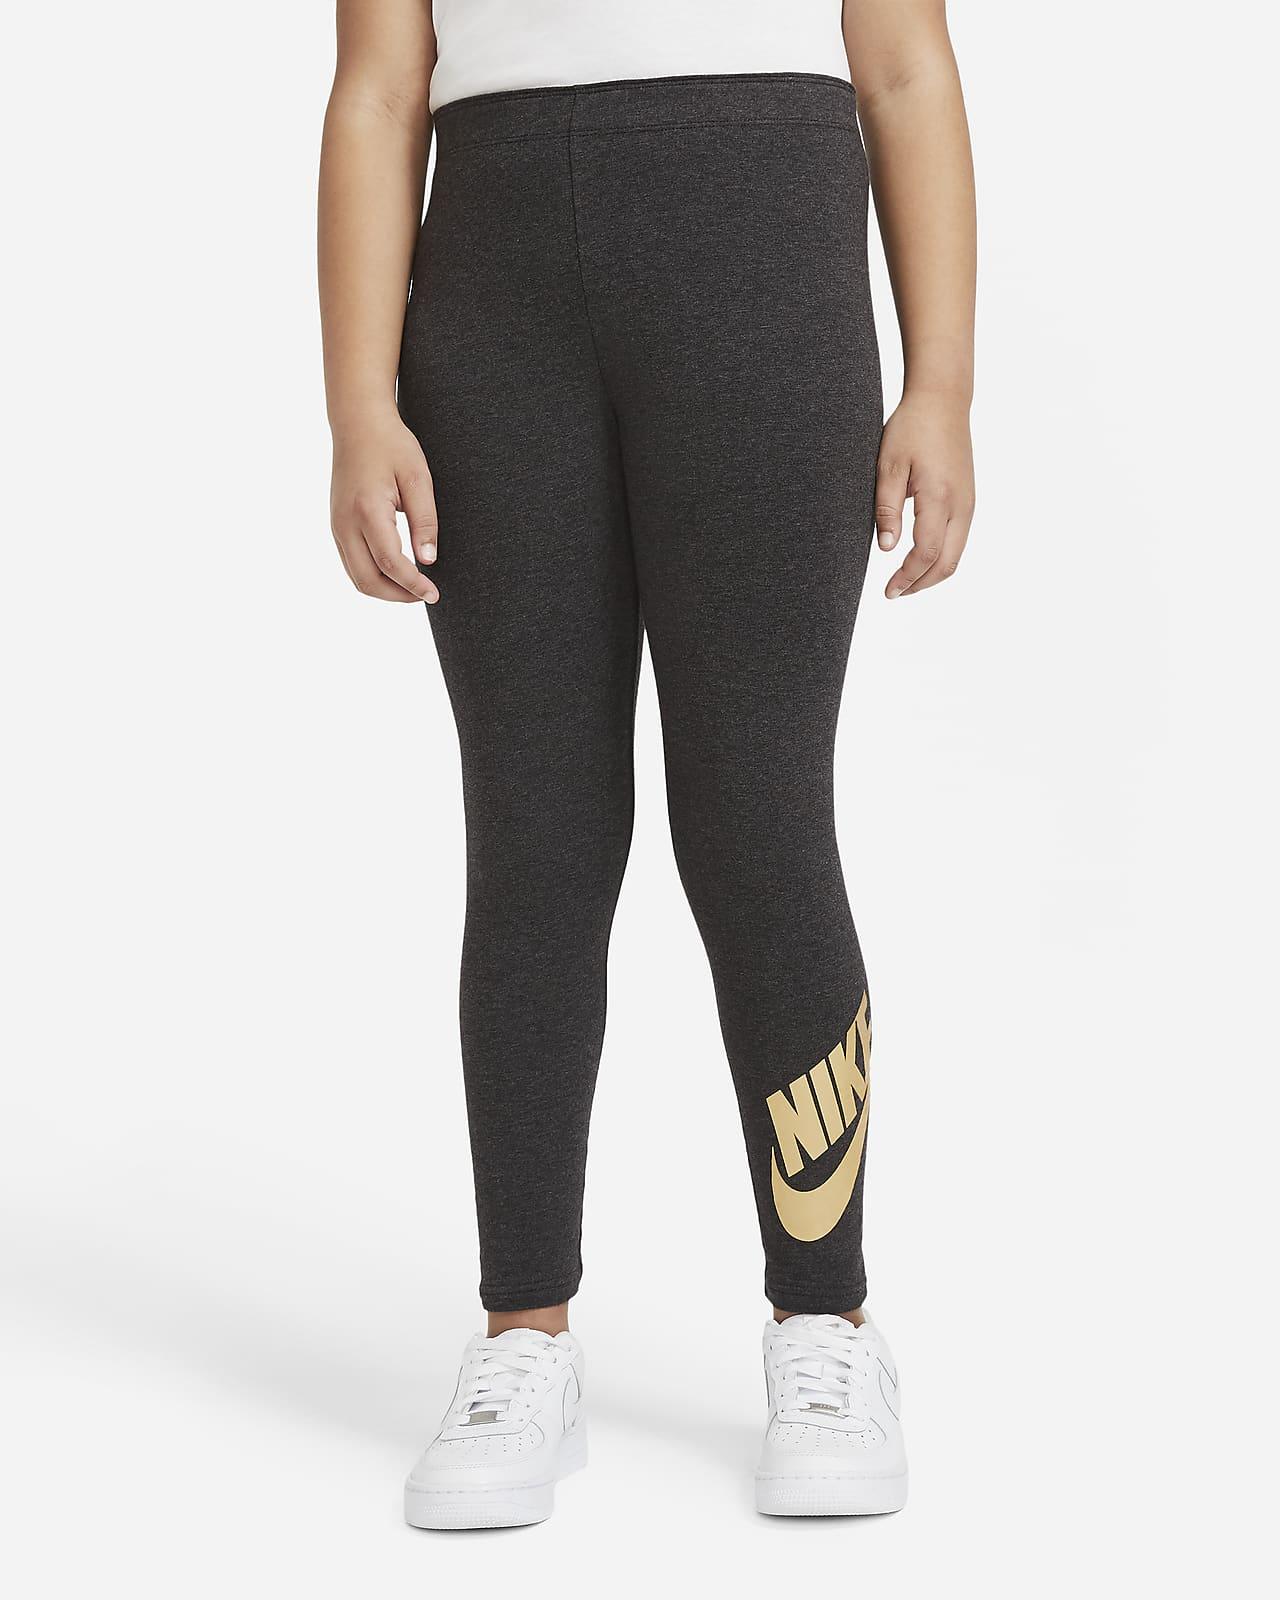 Nike Sportswear Favorites Leggings (Talla grande) - Niña